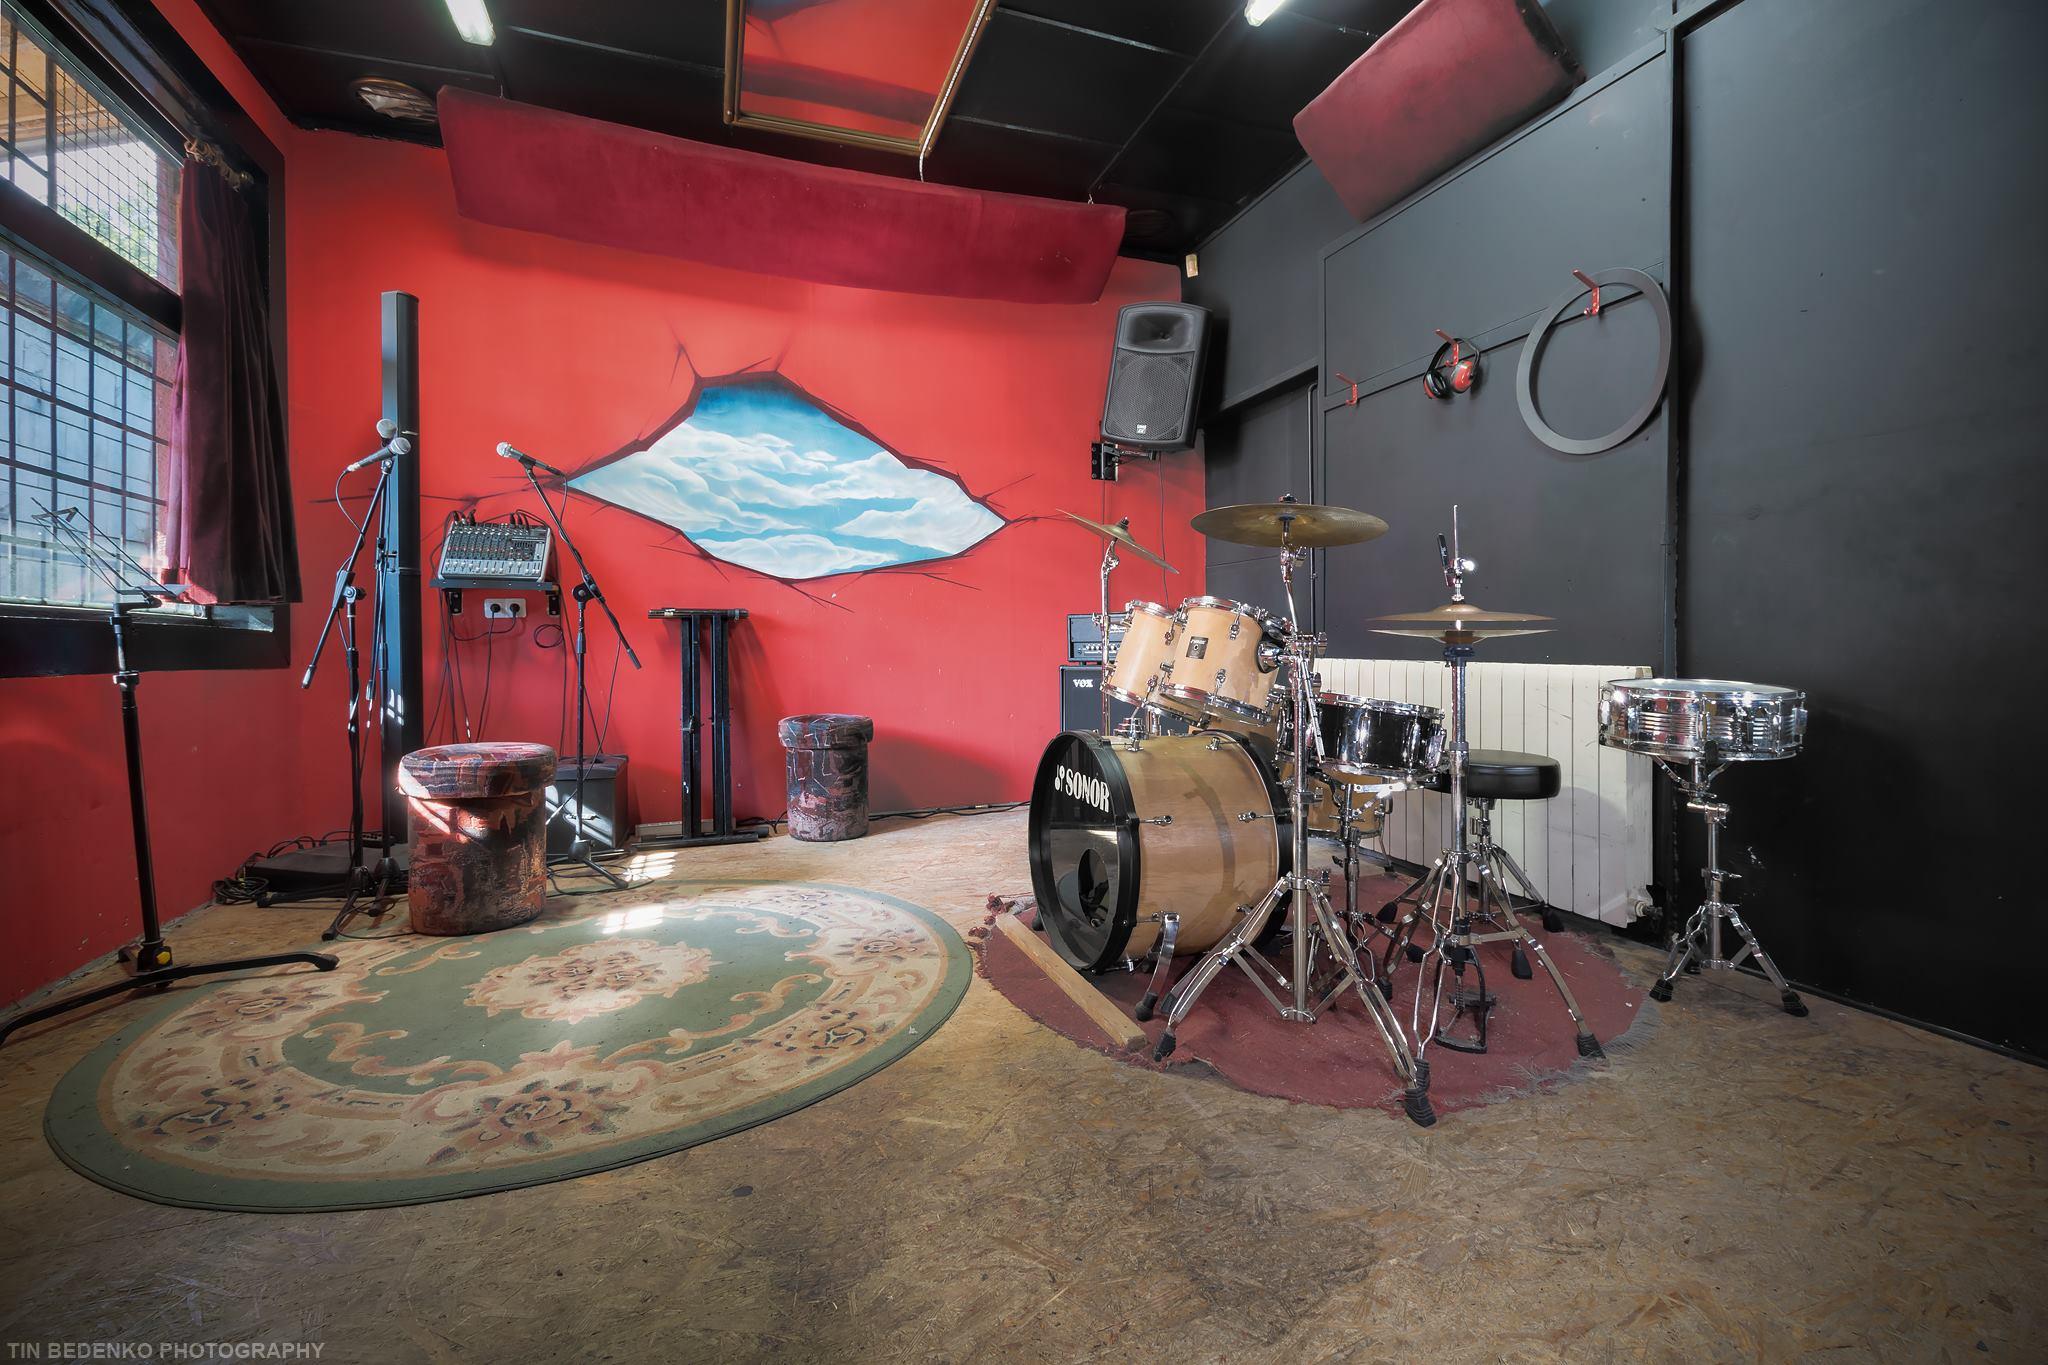 Druženje s tama bubnjevima